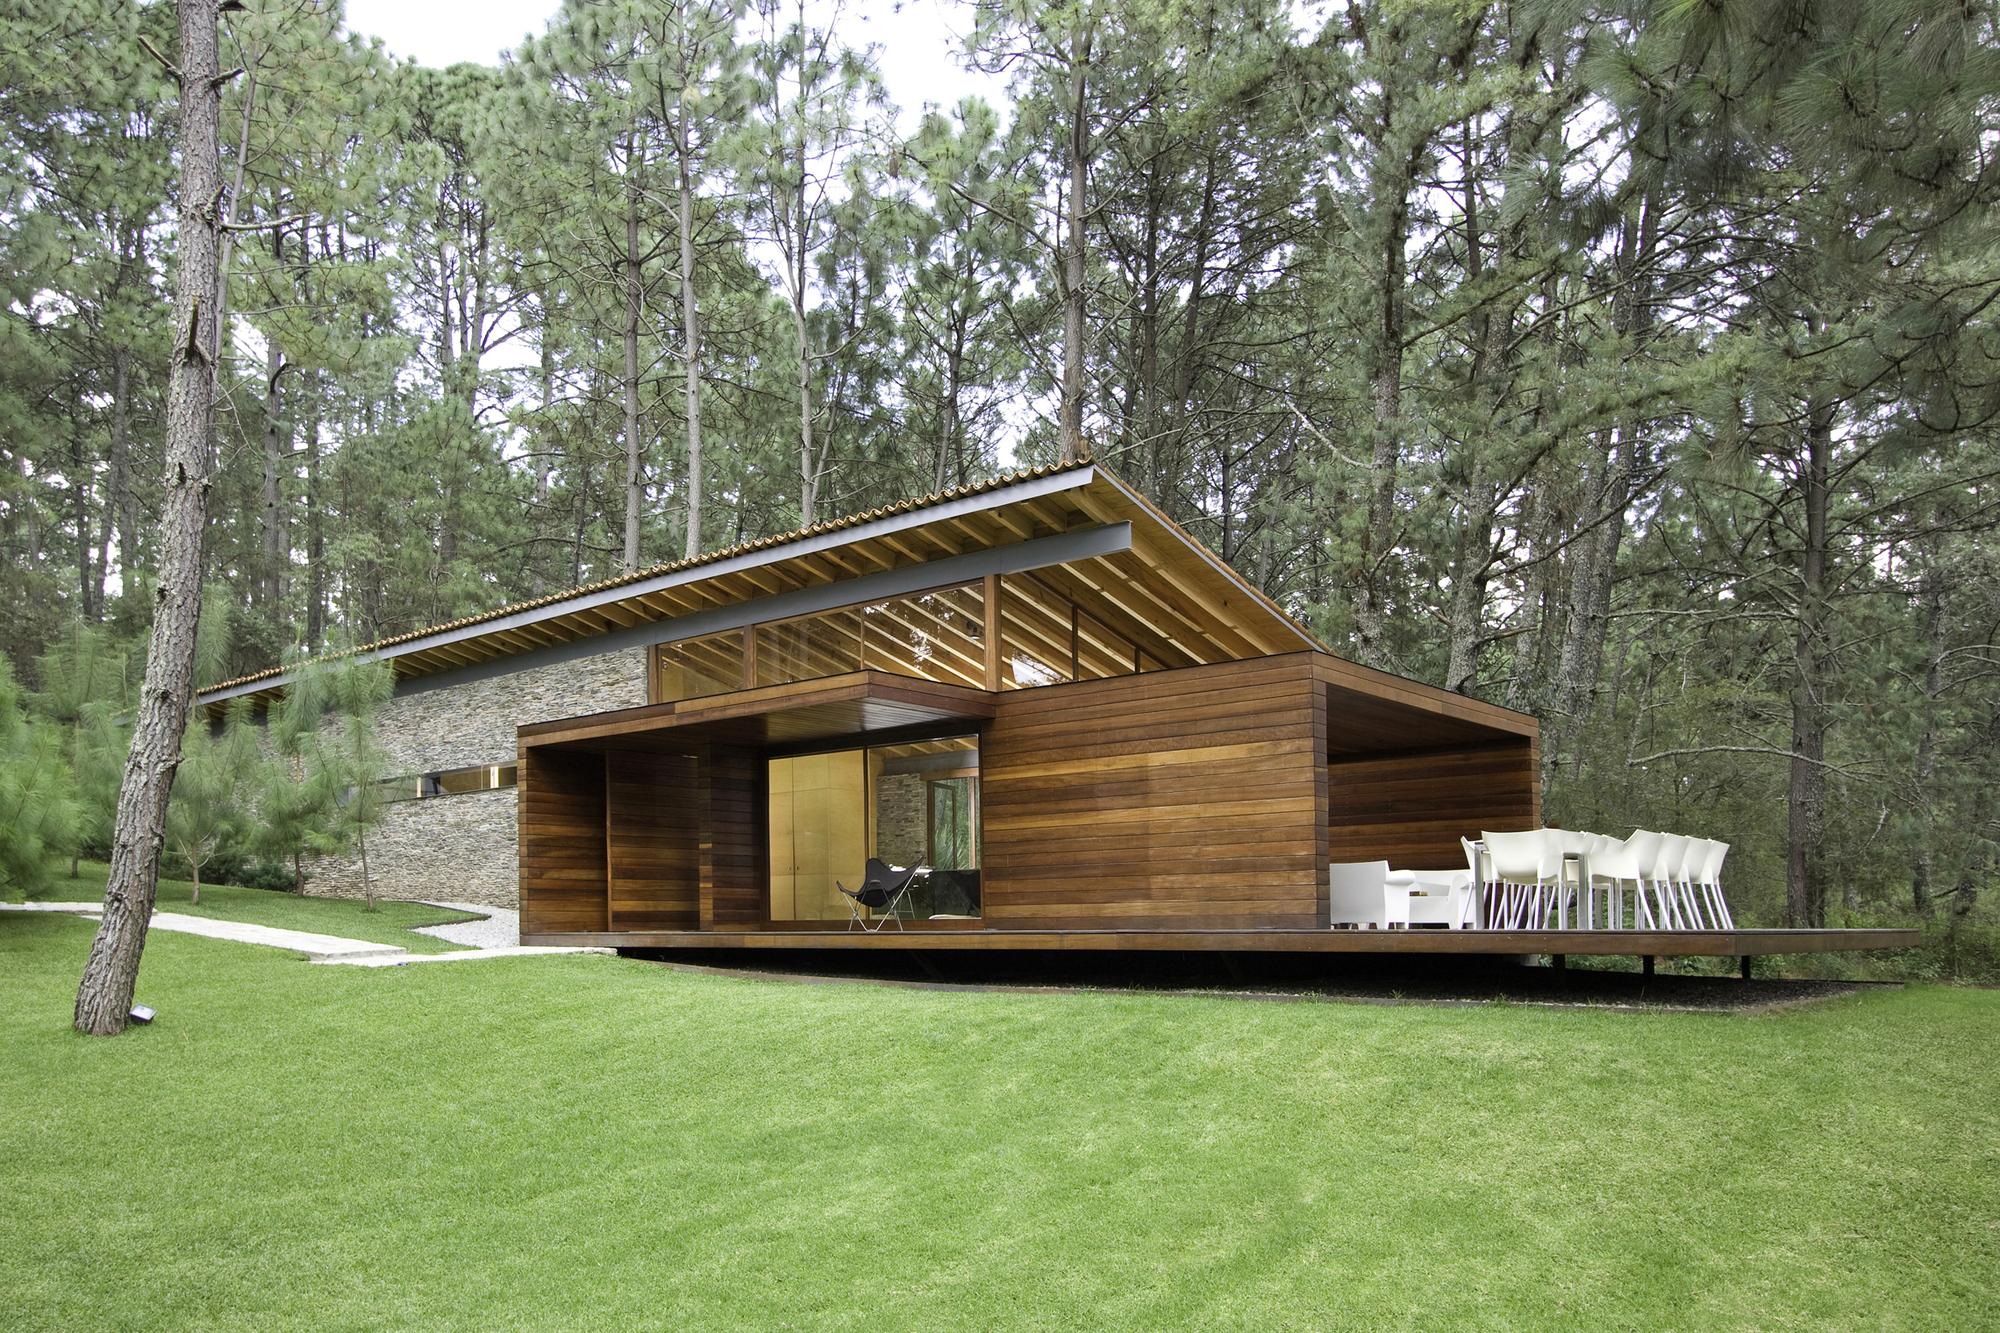 Casa ro tapalpa el as rizo arquitectos archdaily brasil for Casa moderna jardin d el menzah